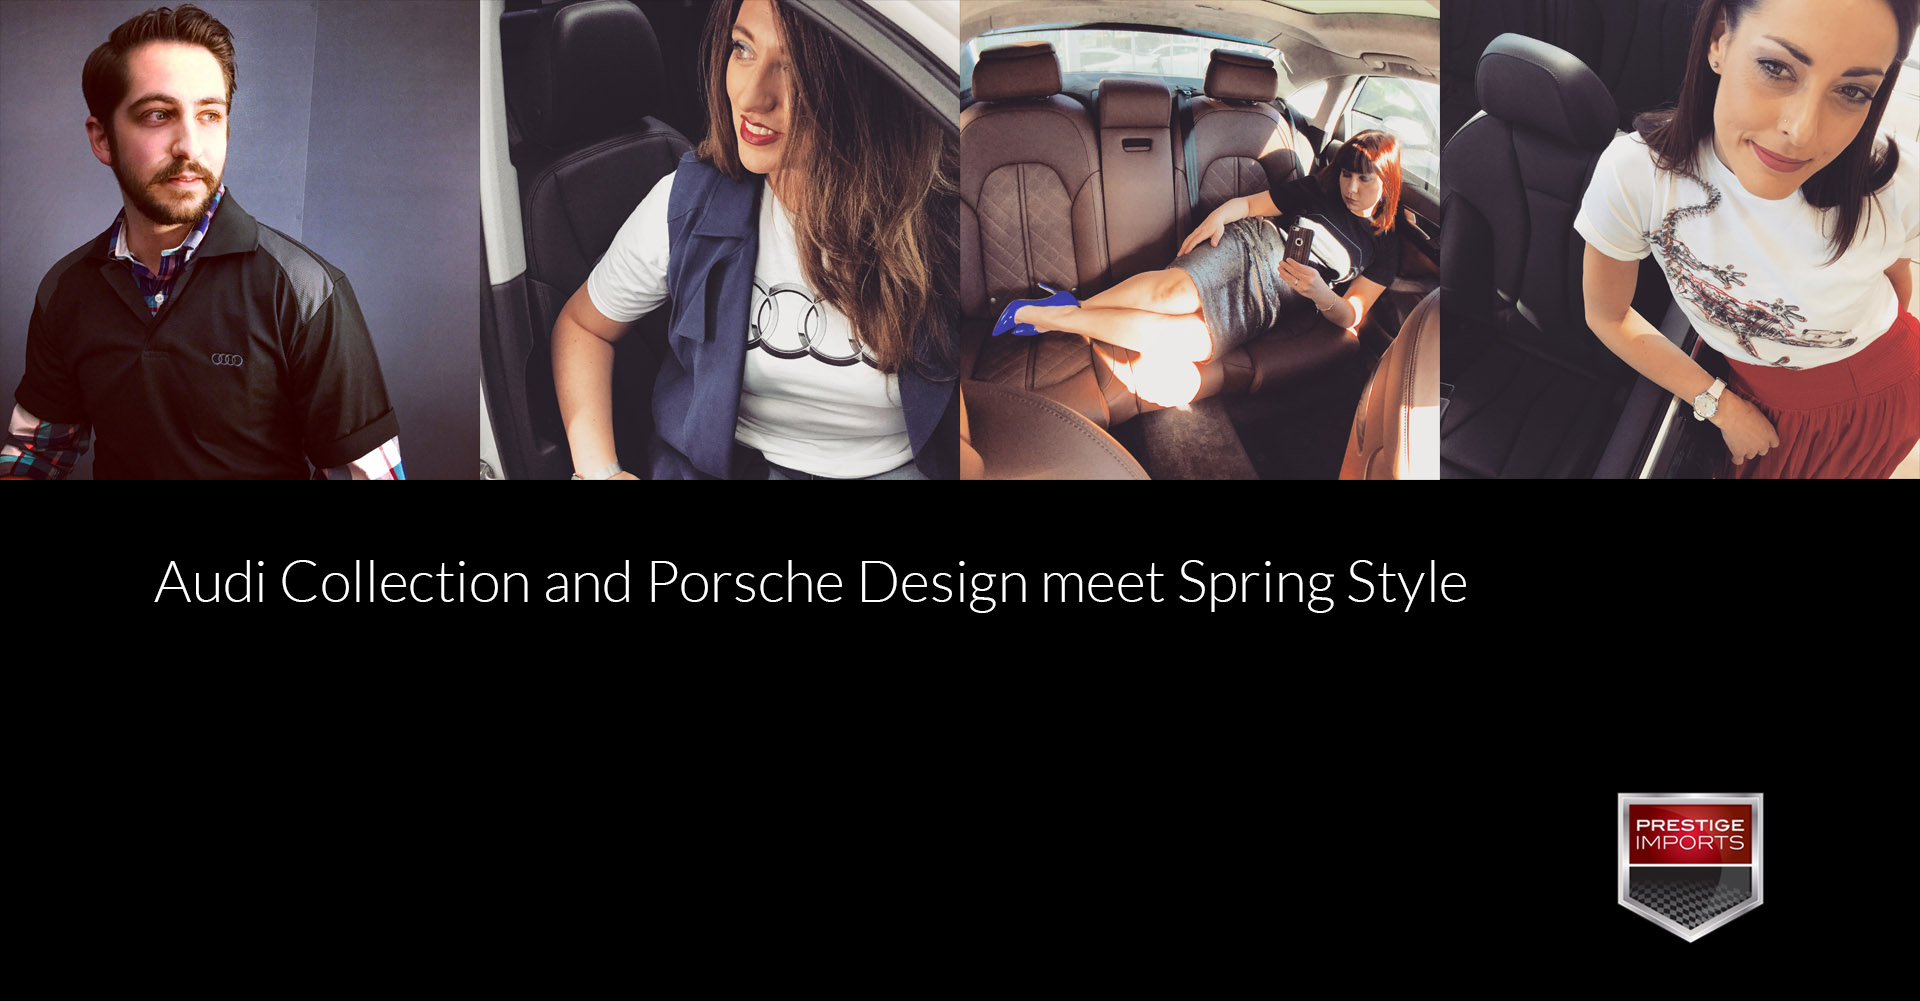 Audi Collection And Porsche Design Meet Spring Style